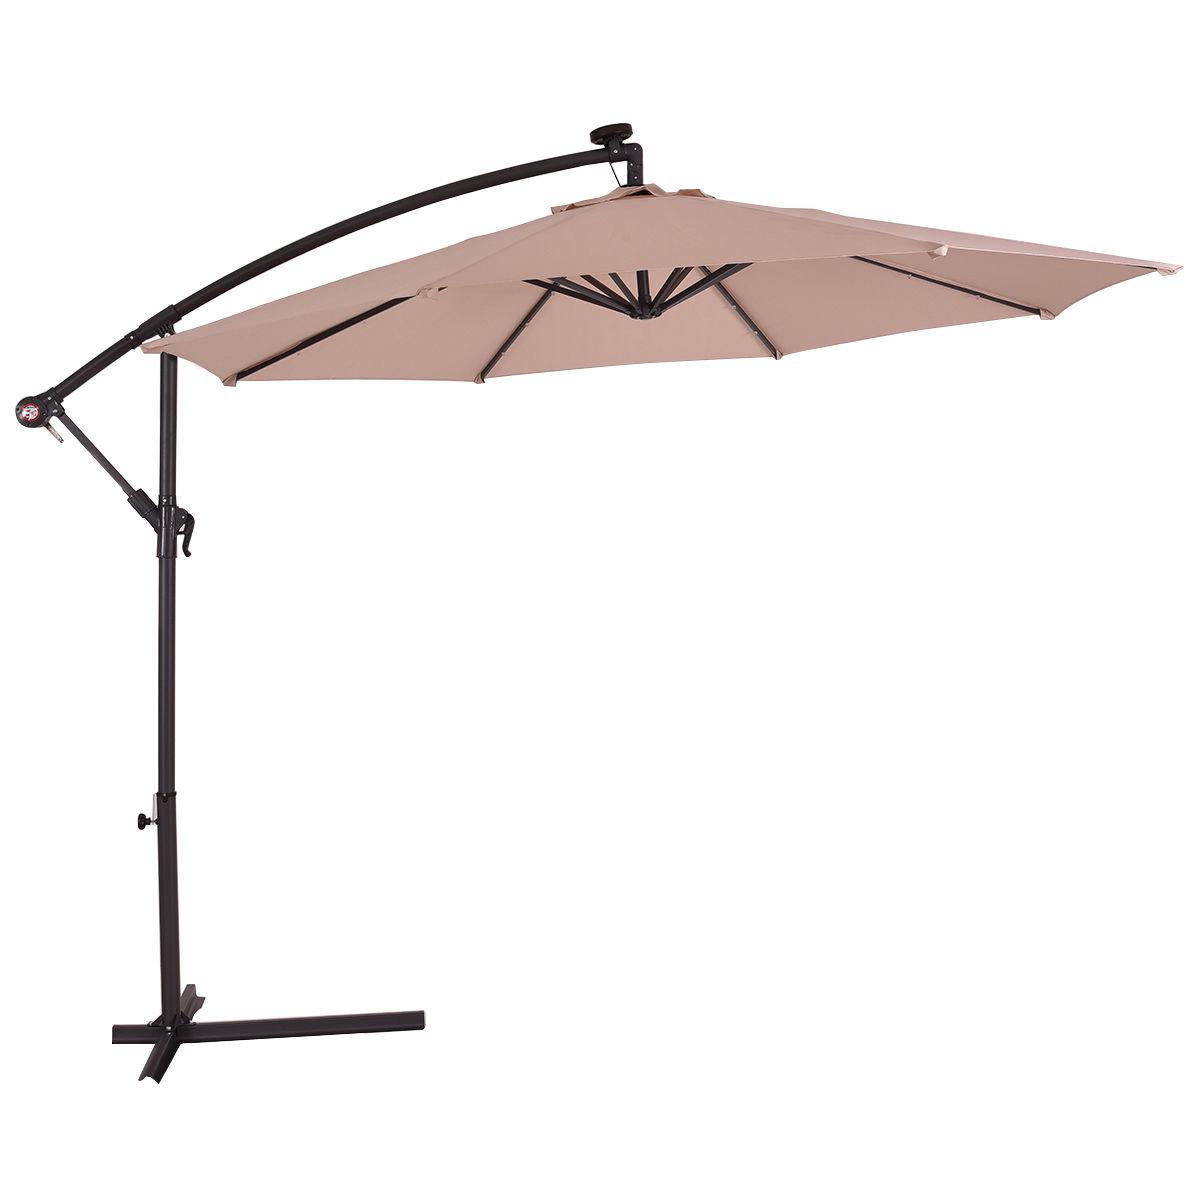 Freeport Park Yajaira 10' Cantilever Umbrella Regarding Popular Judah Cantilever Umbrellas (View 6 of 20)